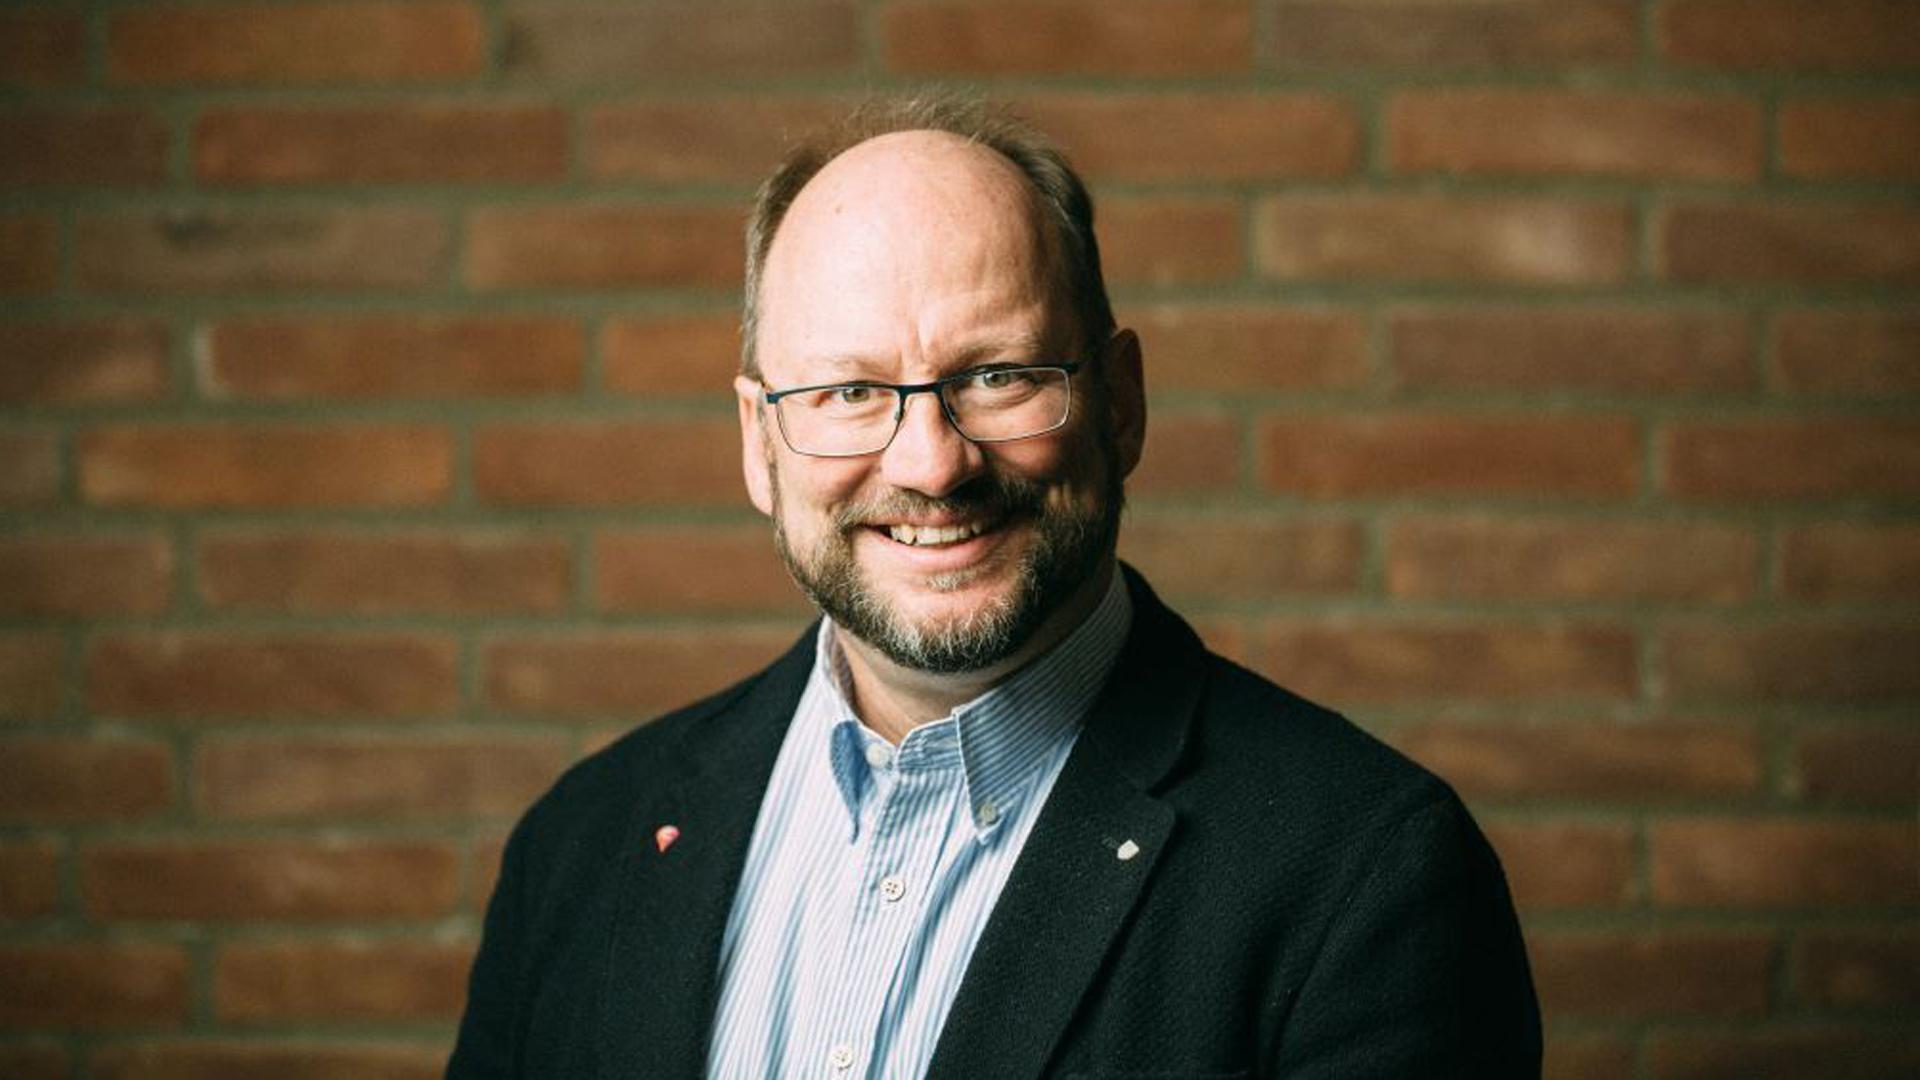 Klaus Göttler folgt am 1. Januar 2020 als neuer EC-Bundespfarrer auf Rudolf Westerheide